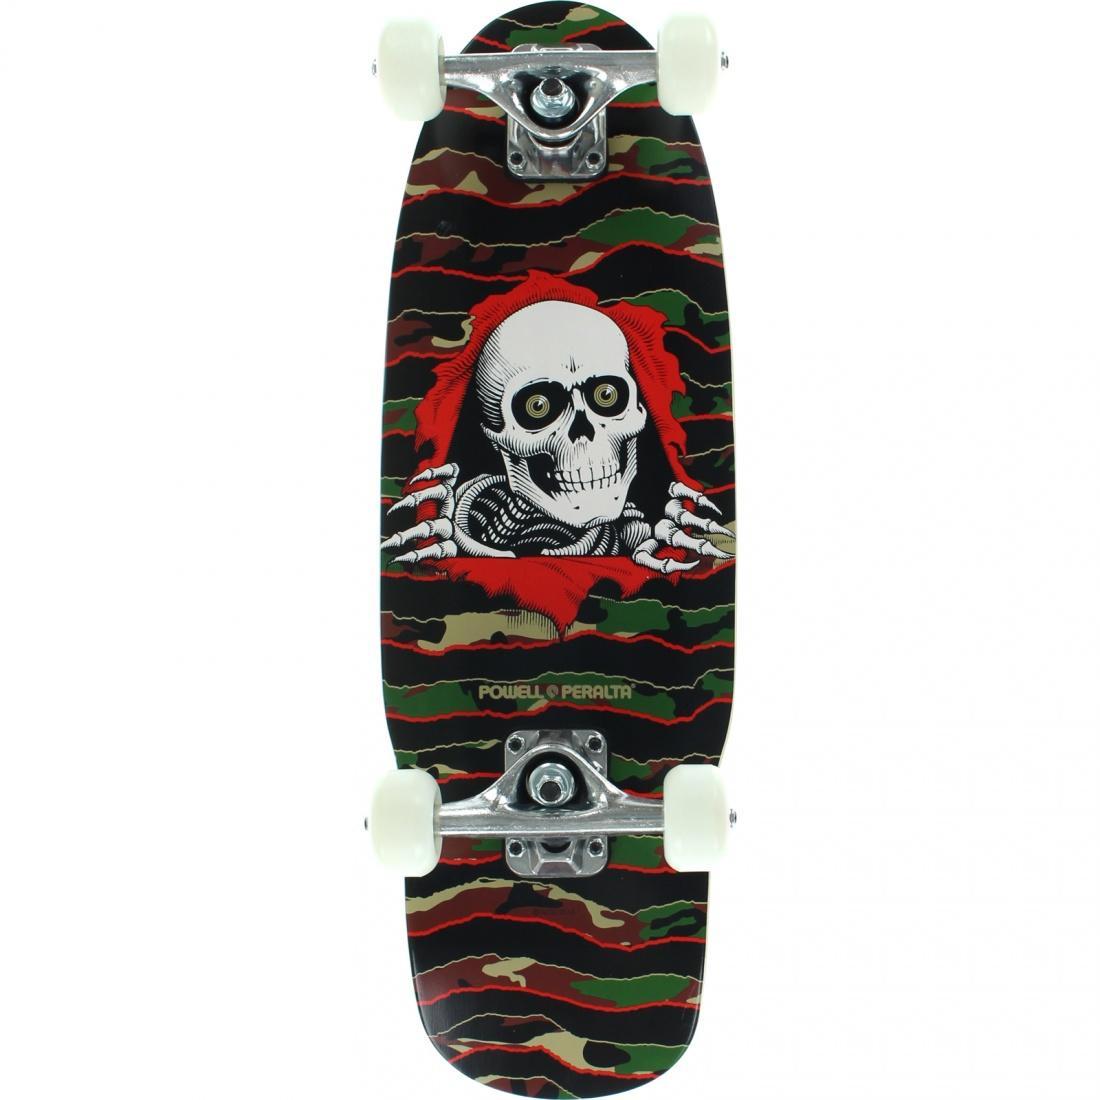 Скейтборд в сборе Powell Peralta Cab Dragon купить в Boardshop №1